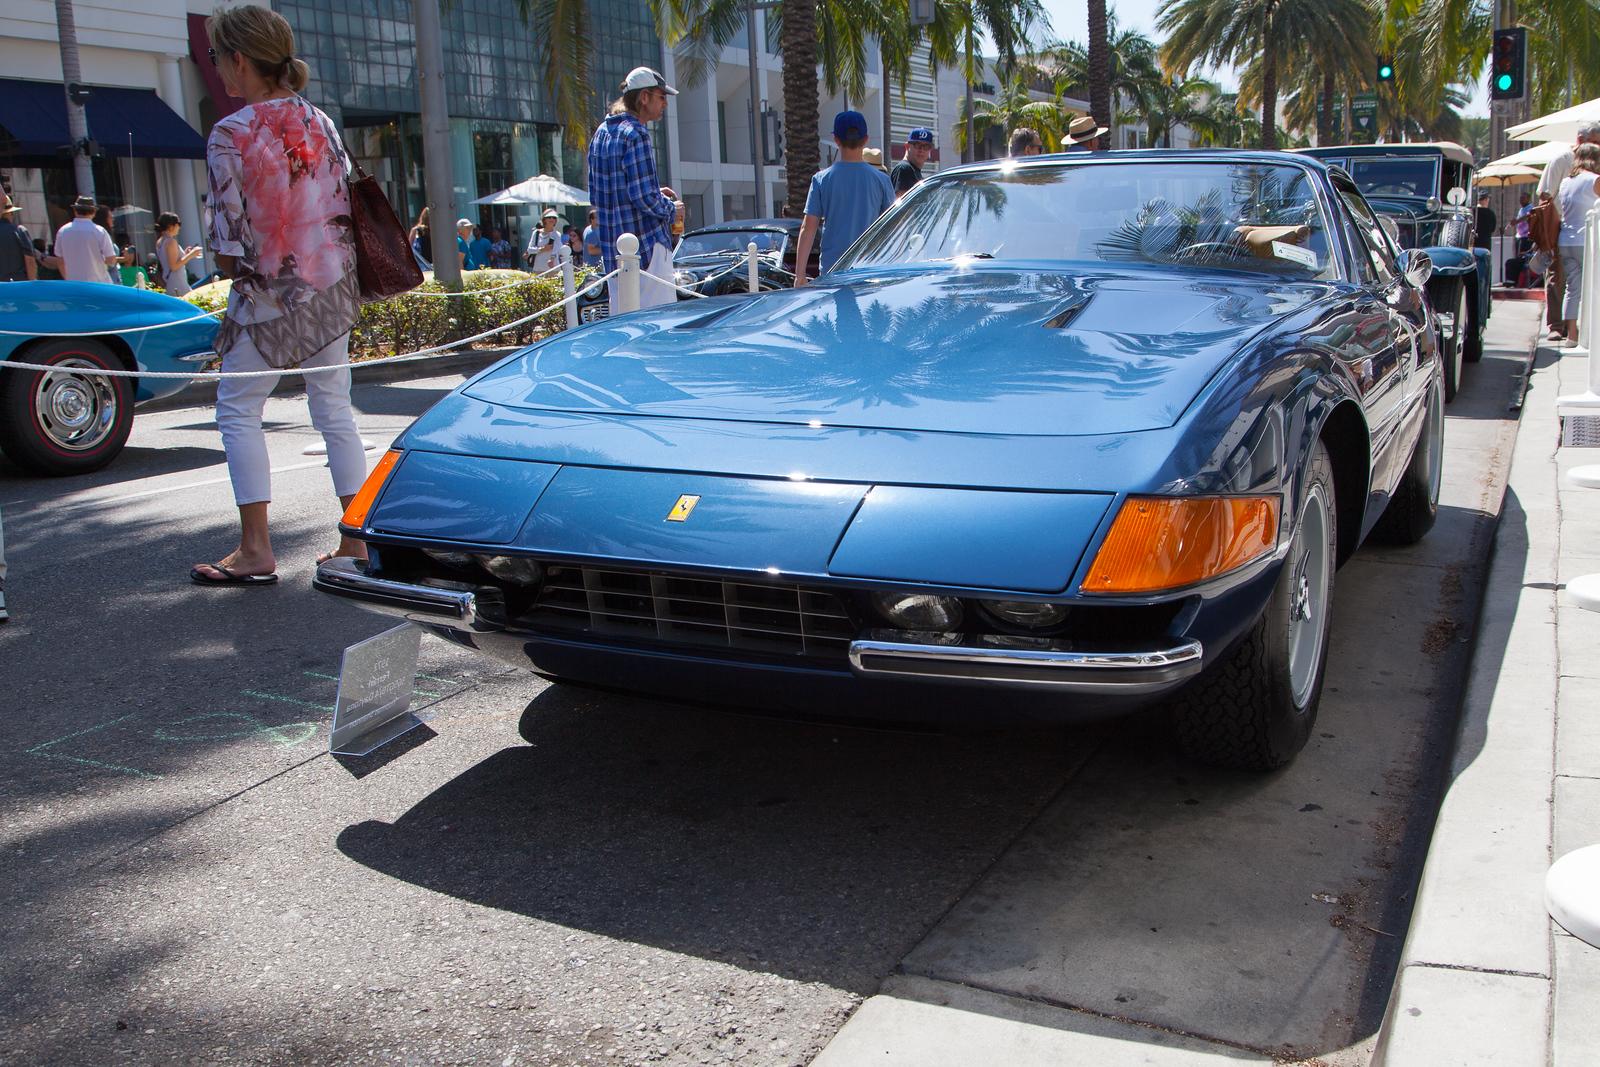 1972 Ferrari 365 GTB/4 Daytona, owned by Thomas Shannon